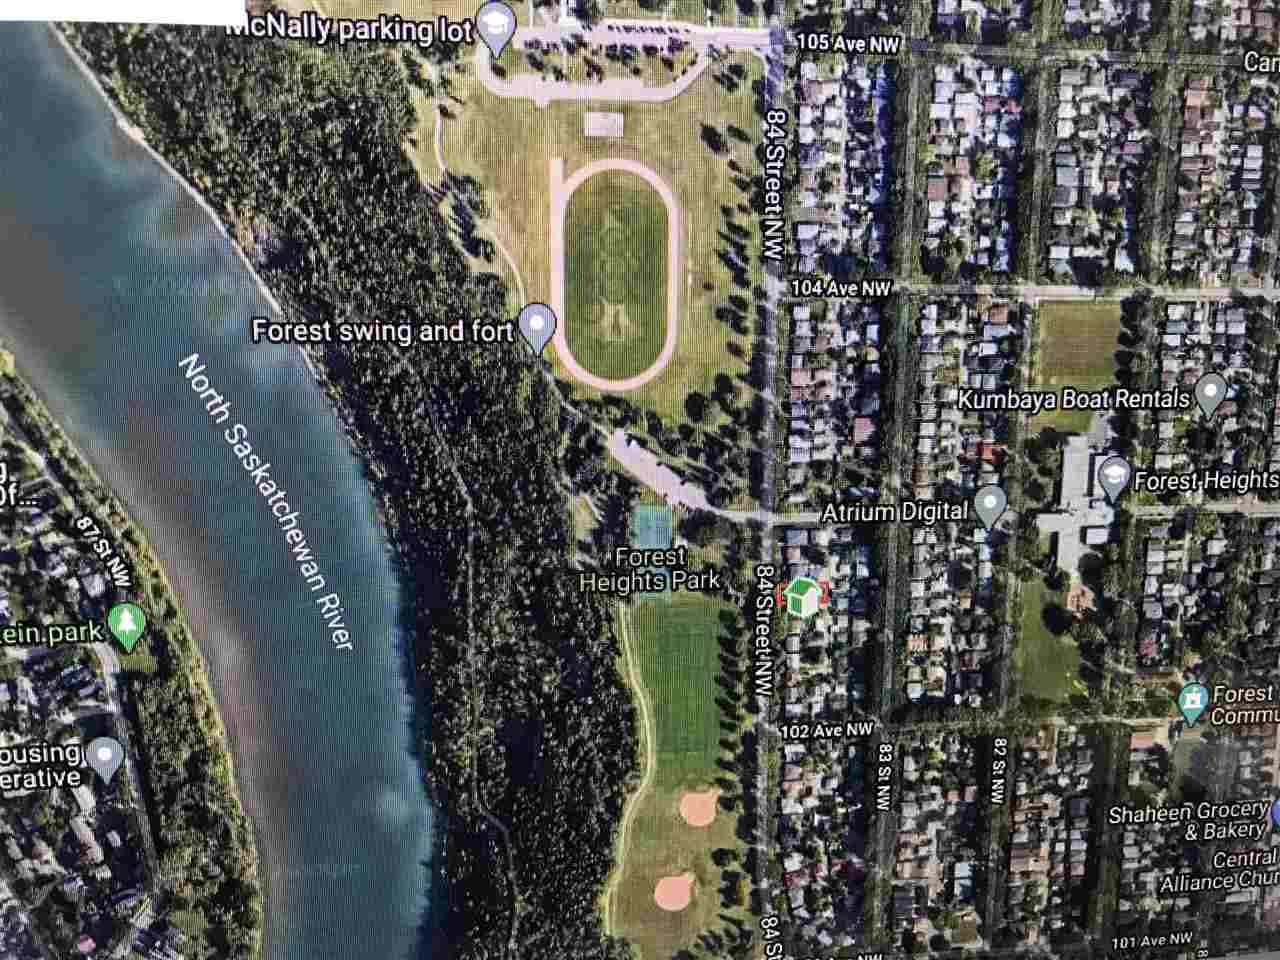 Main Photo: 10219 84 Street in Edmonton: Zone 19 House for sale : MLS®# E4221302